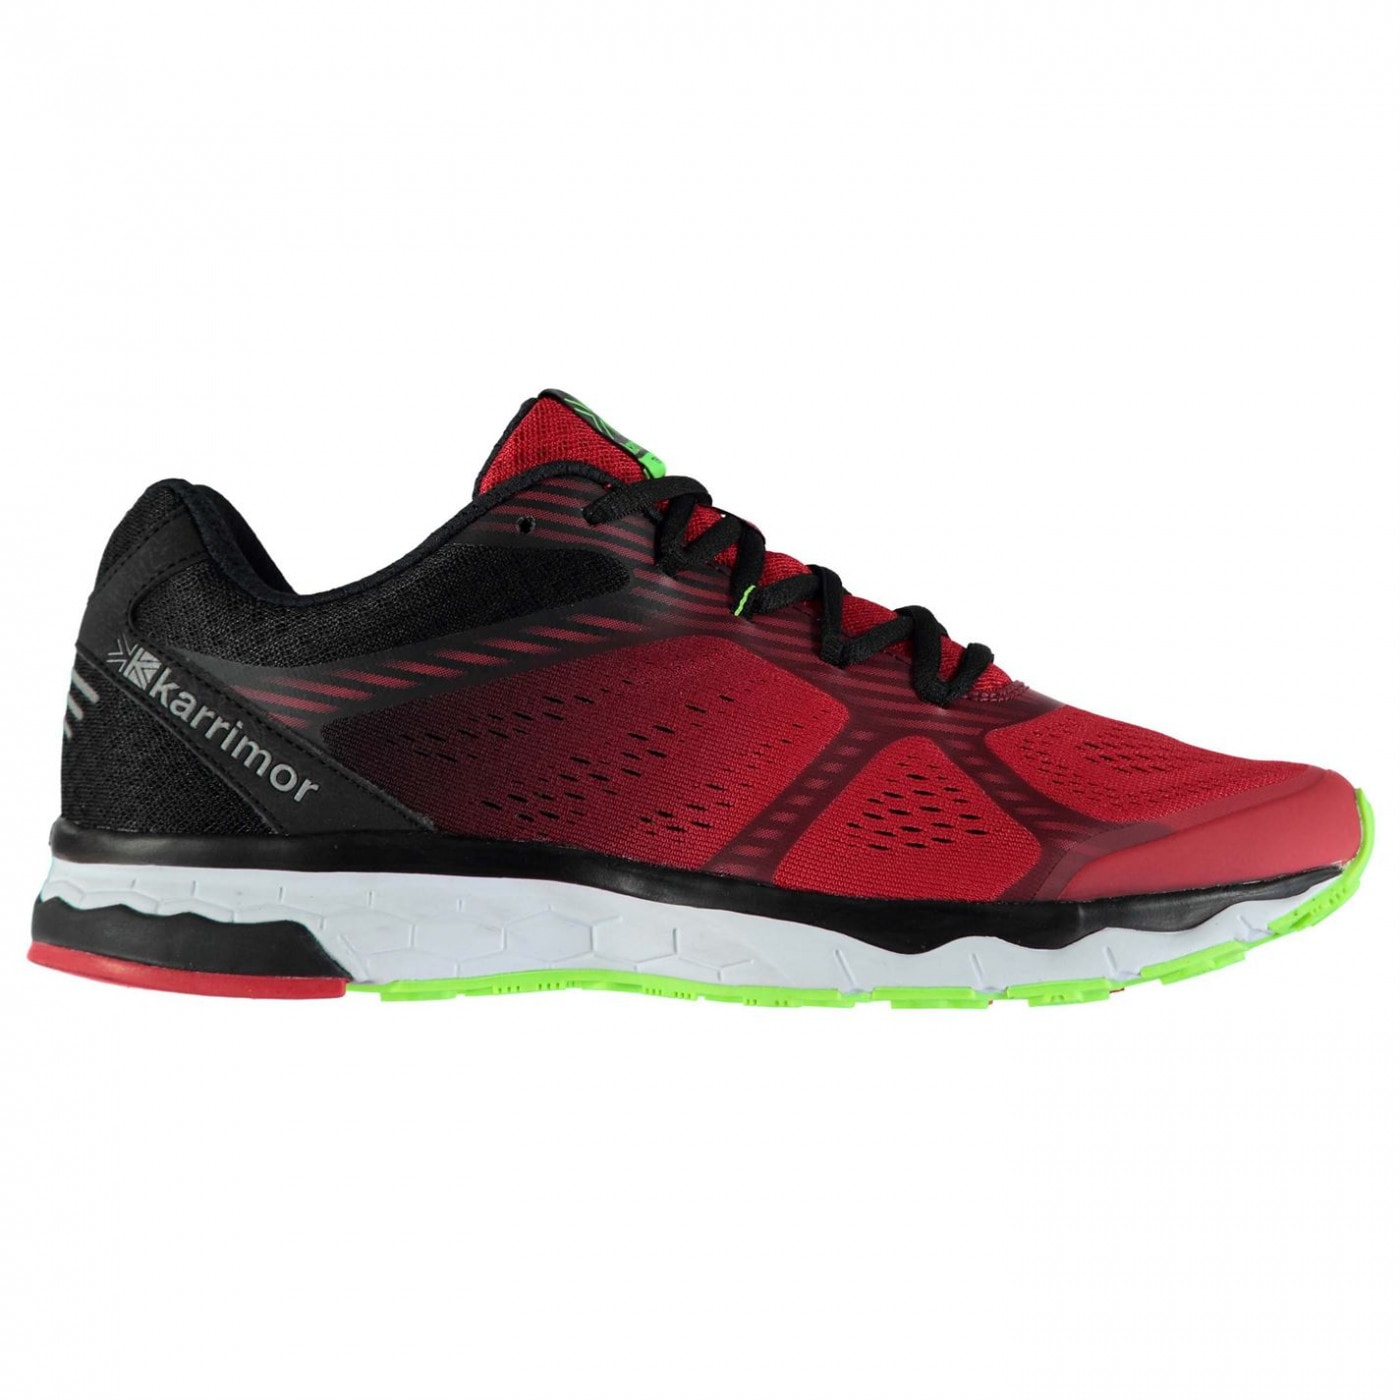 Karrimor Tempo 5 Mens Running Shoes - FACTCOOL